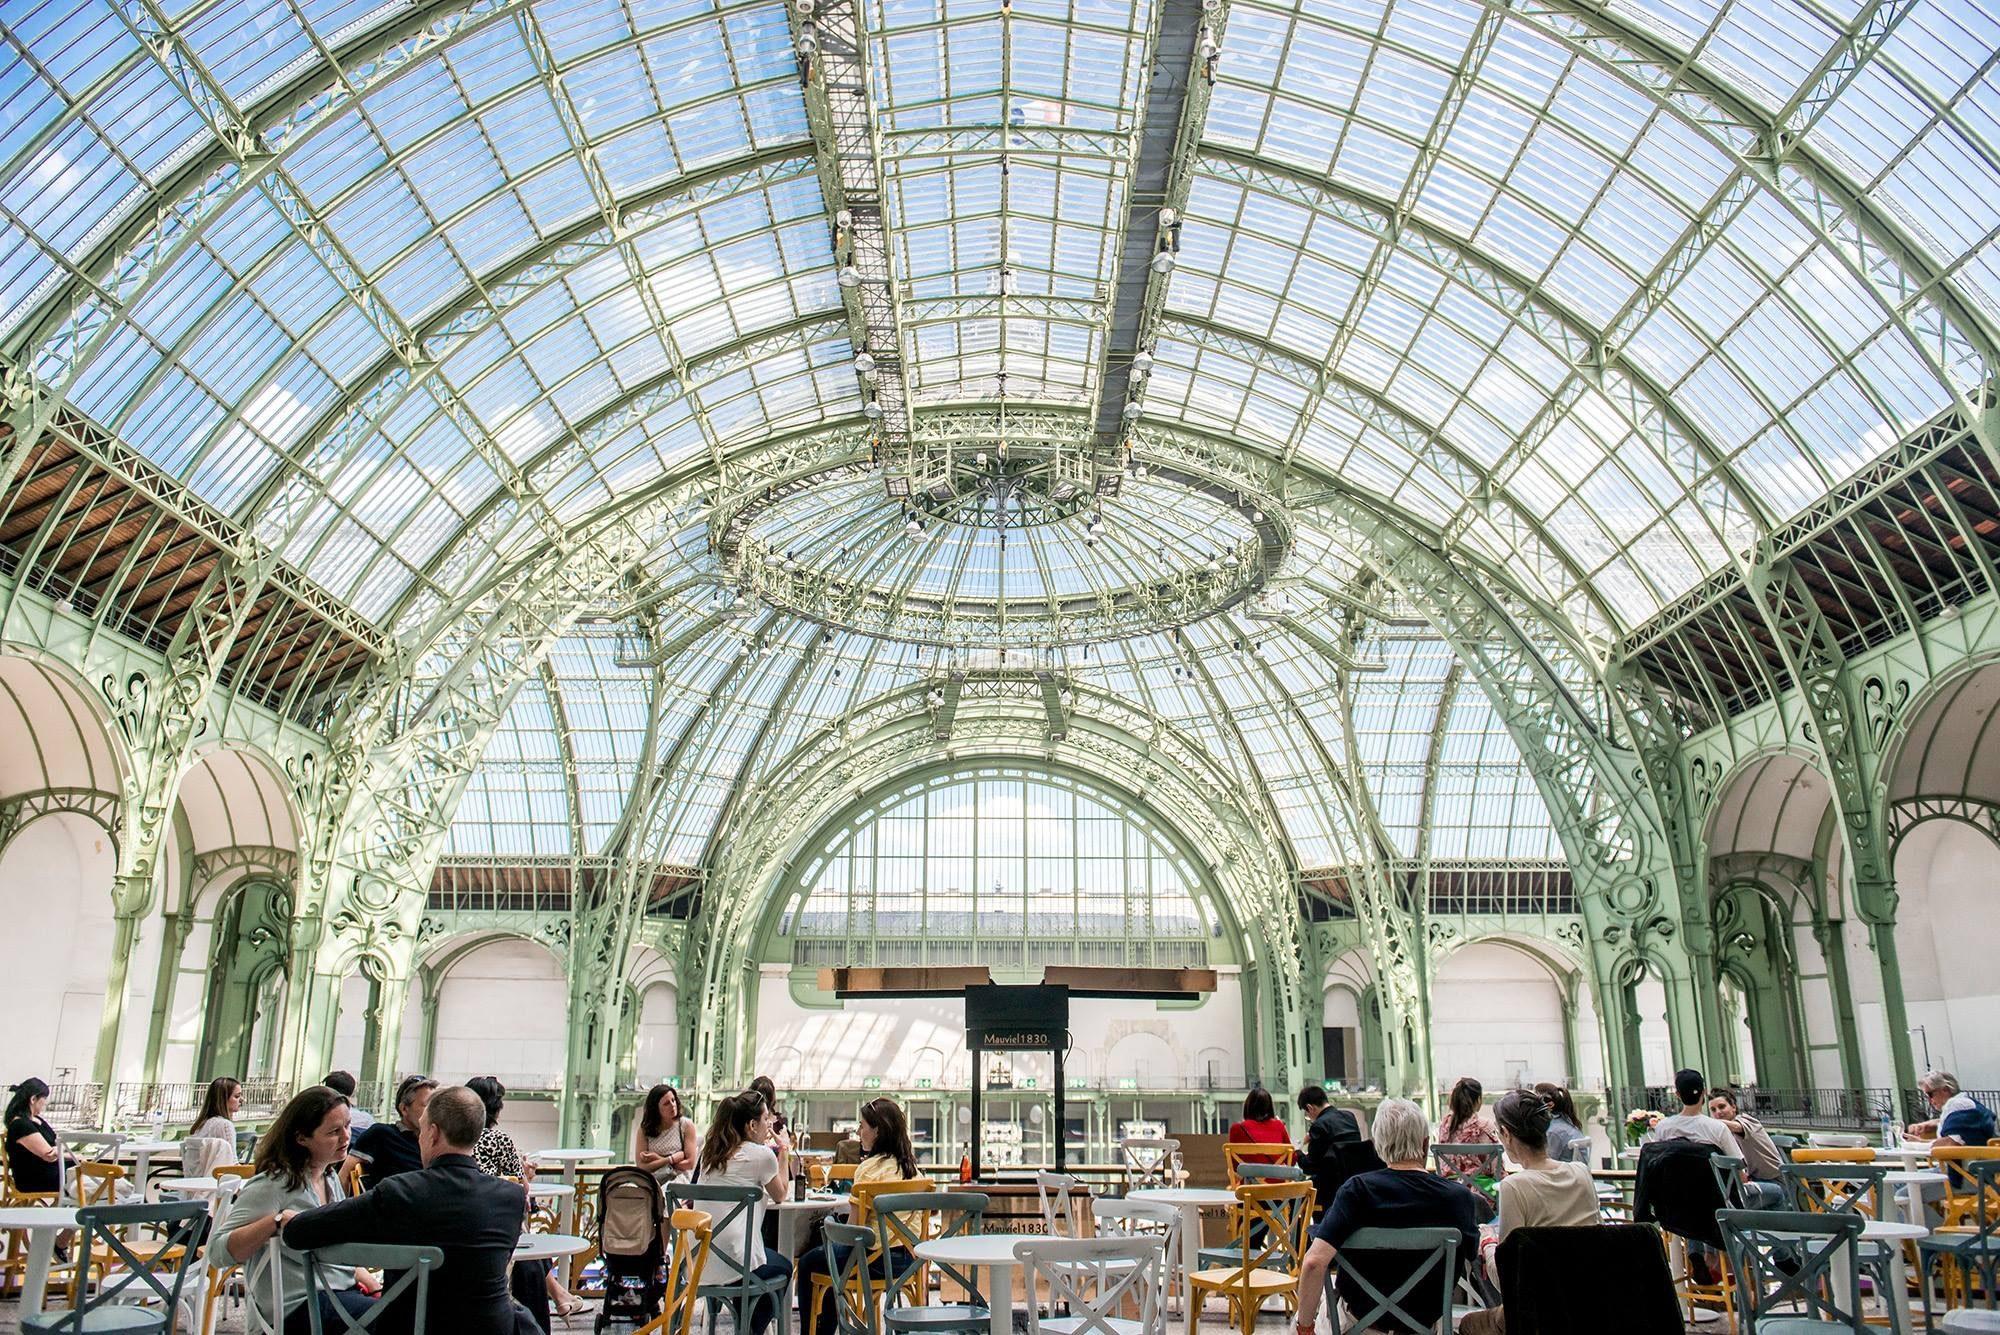 The Mondial de la Bière event in Paris in May at the Grand Palais.